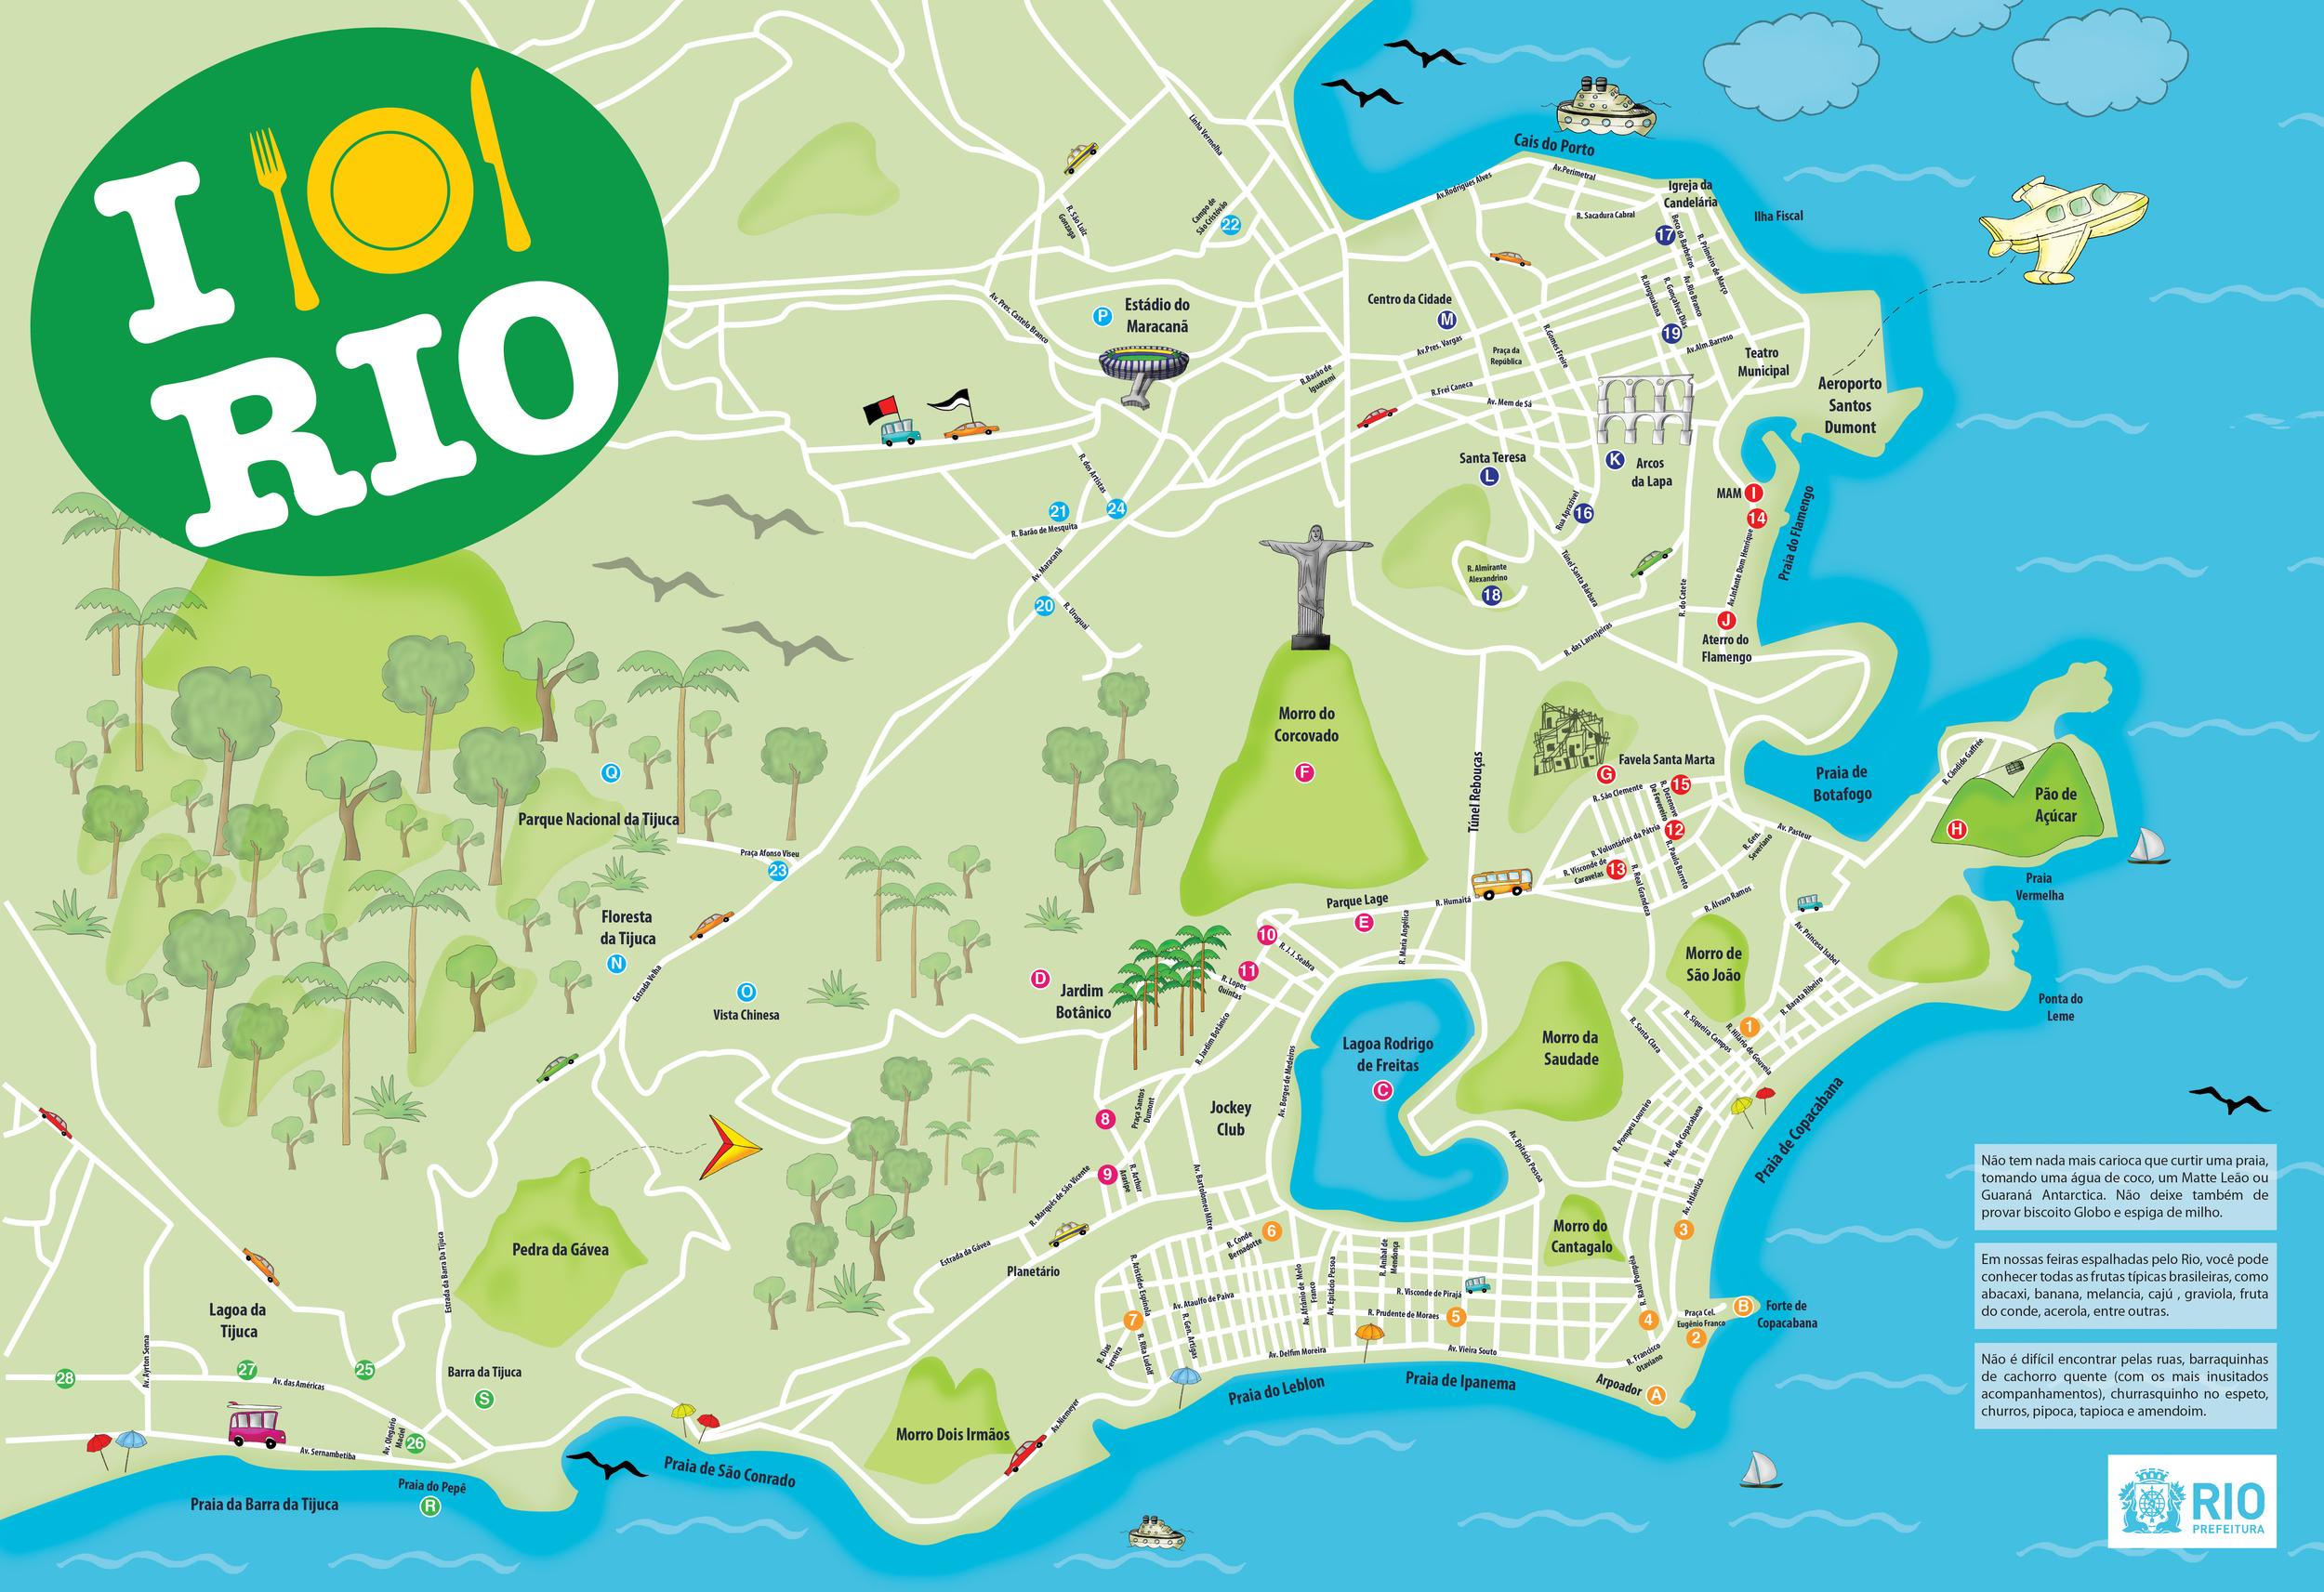 IeatRio-map.jpg